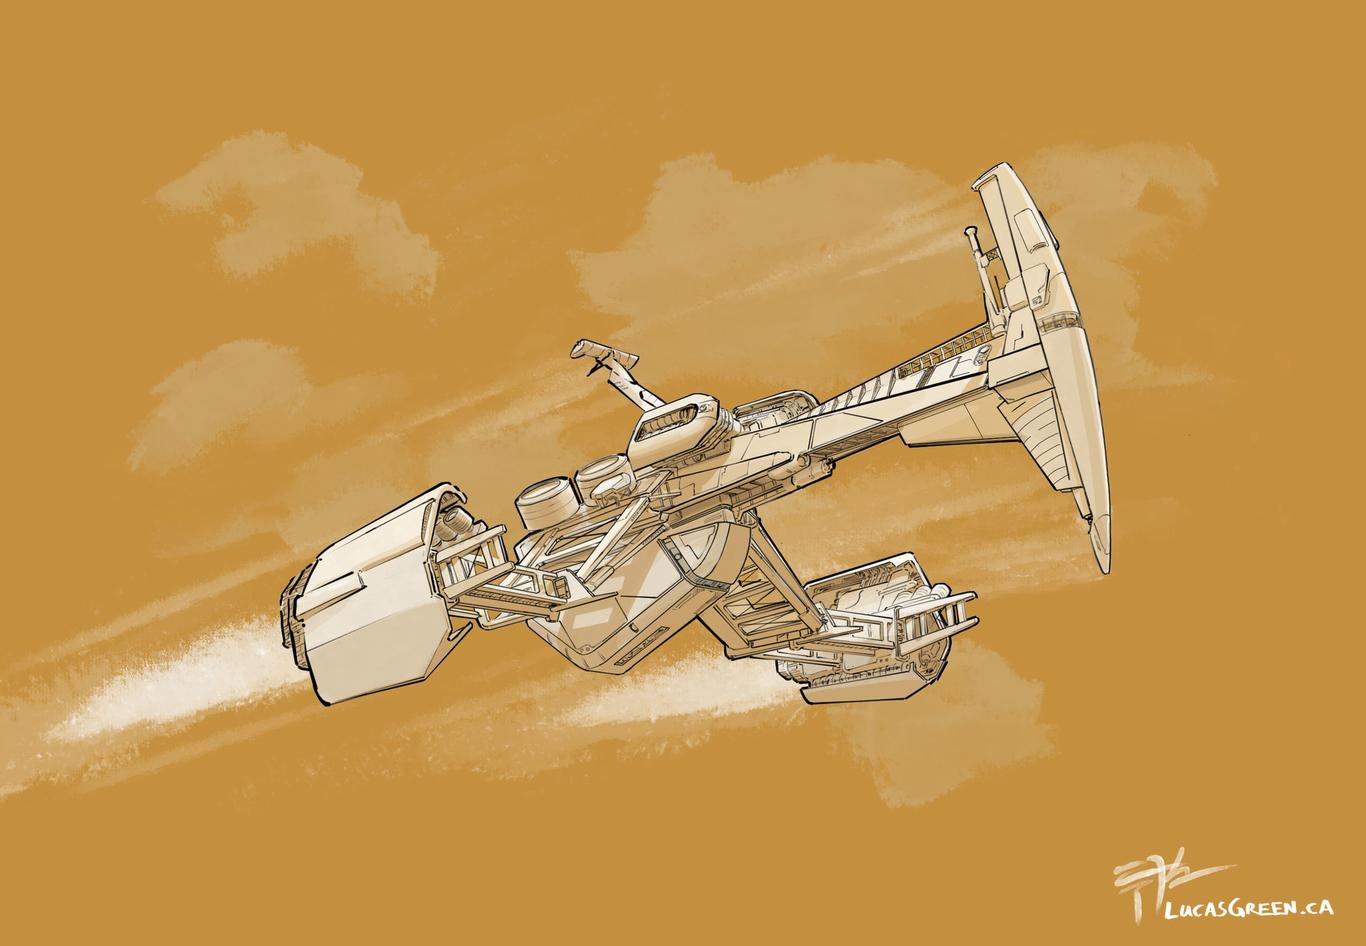 Lucasgreen spaceship sketch 1 180690b5 pjww